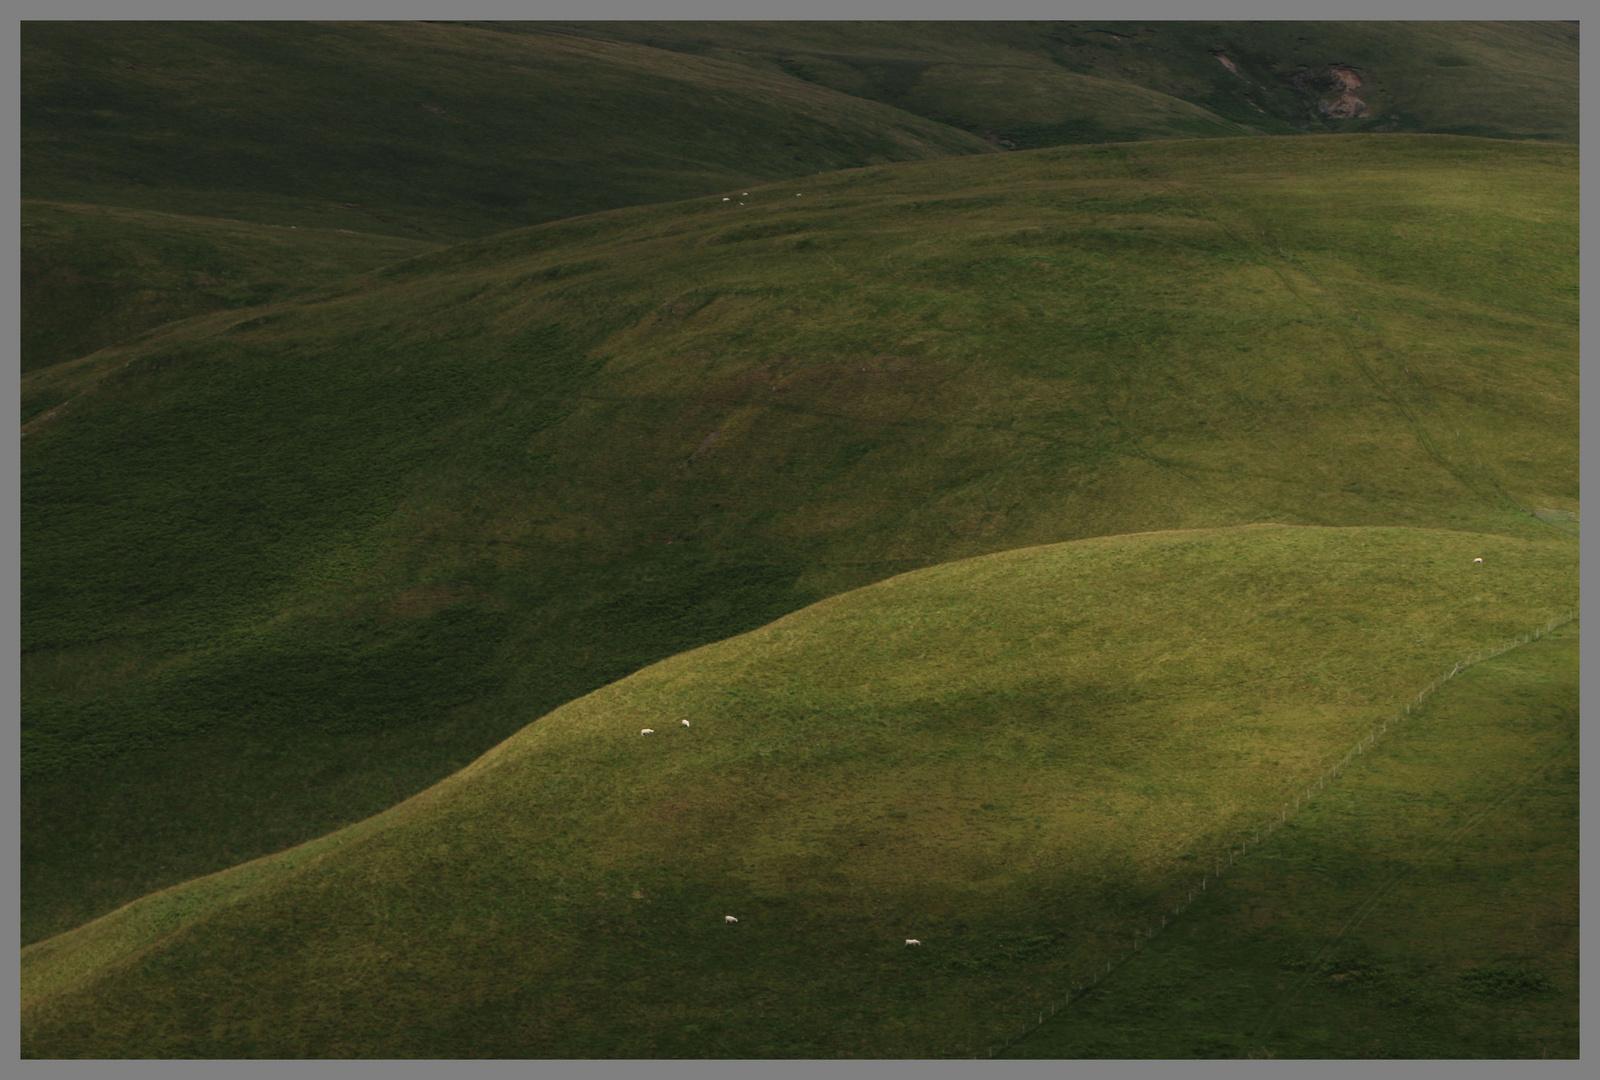 sheep grazing 3b near the Street Cheviot Hills